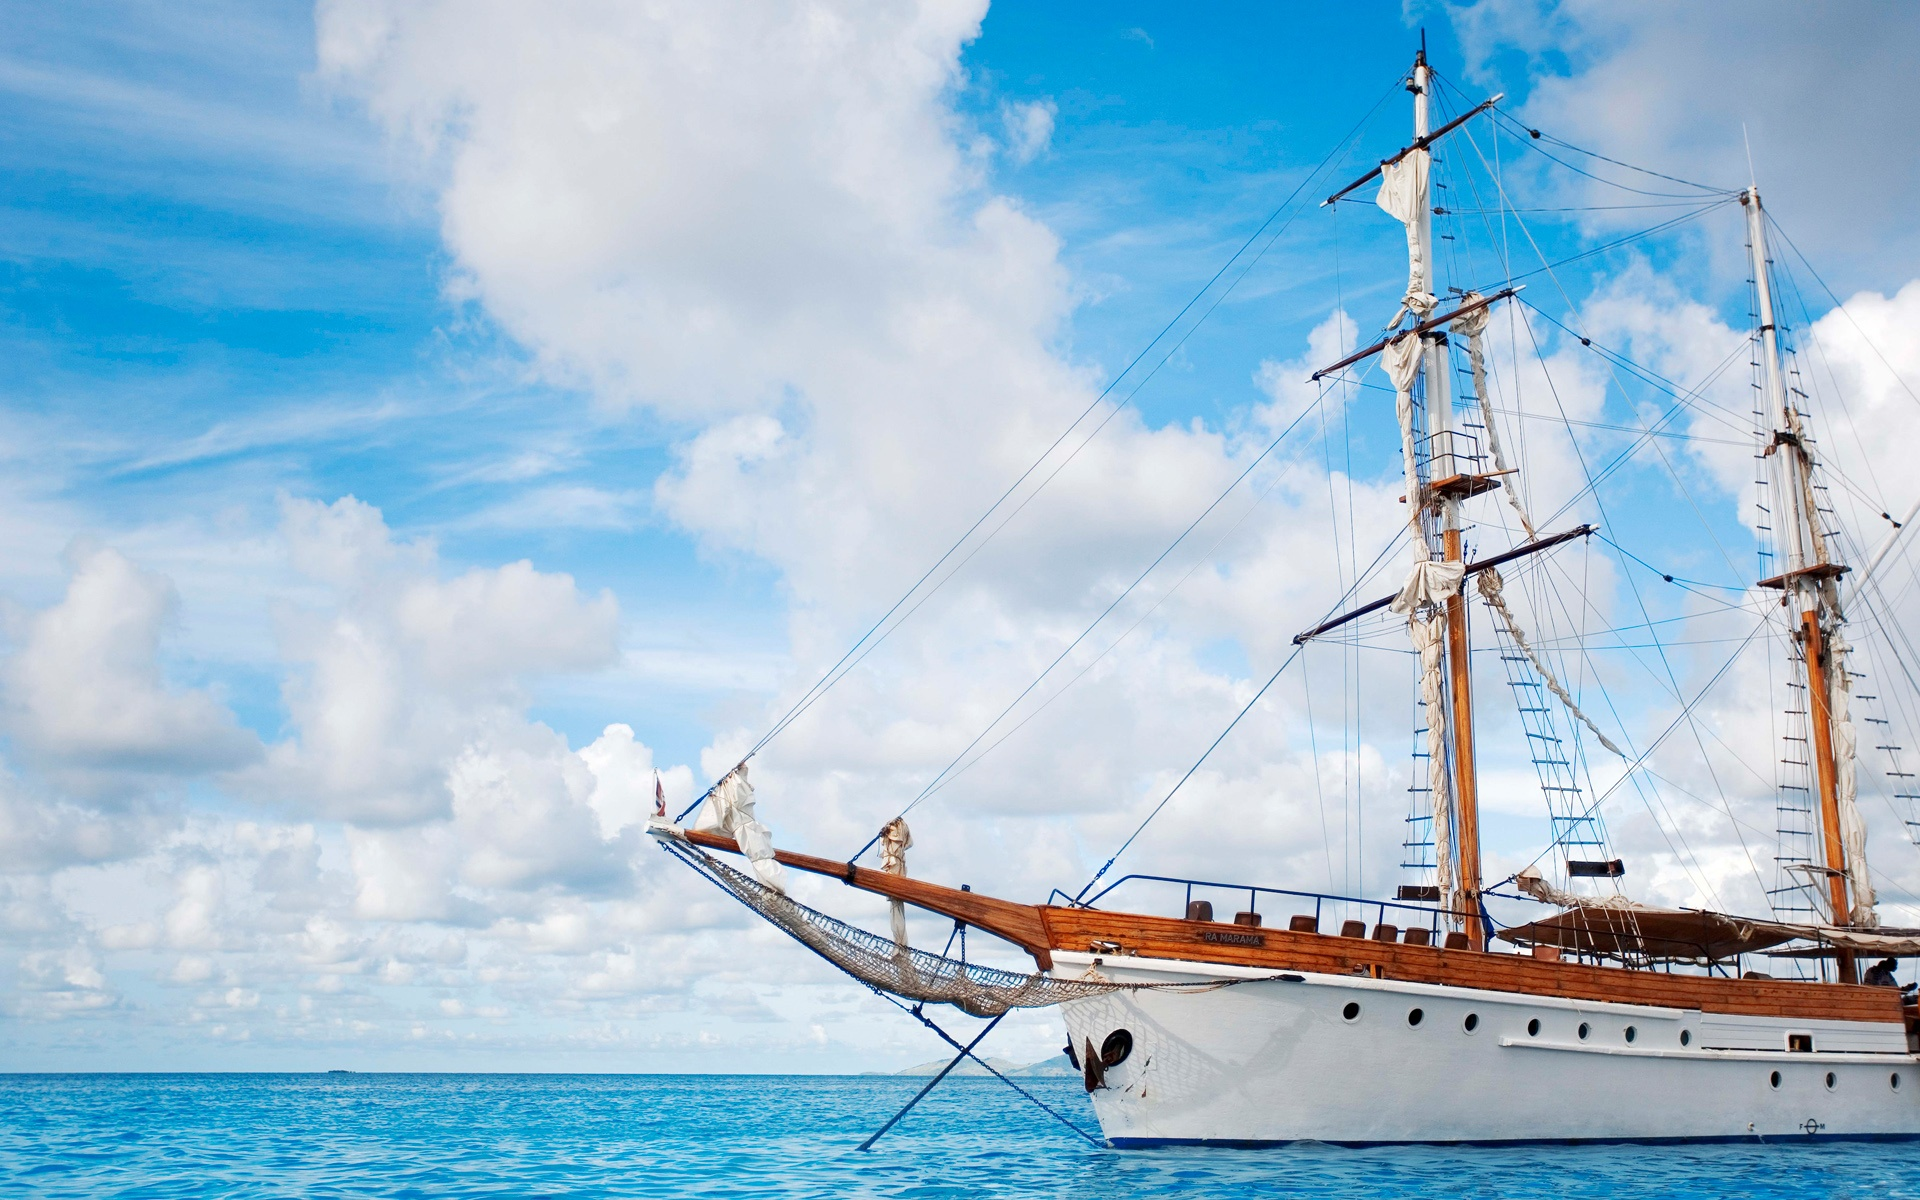 sailboat desktop hd wallpaper 51560